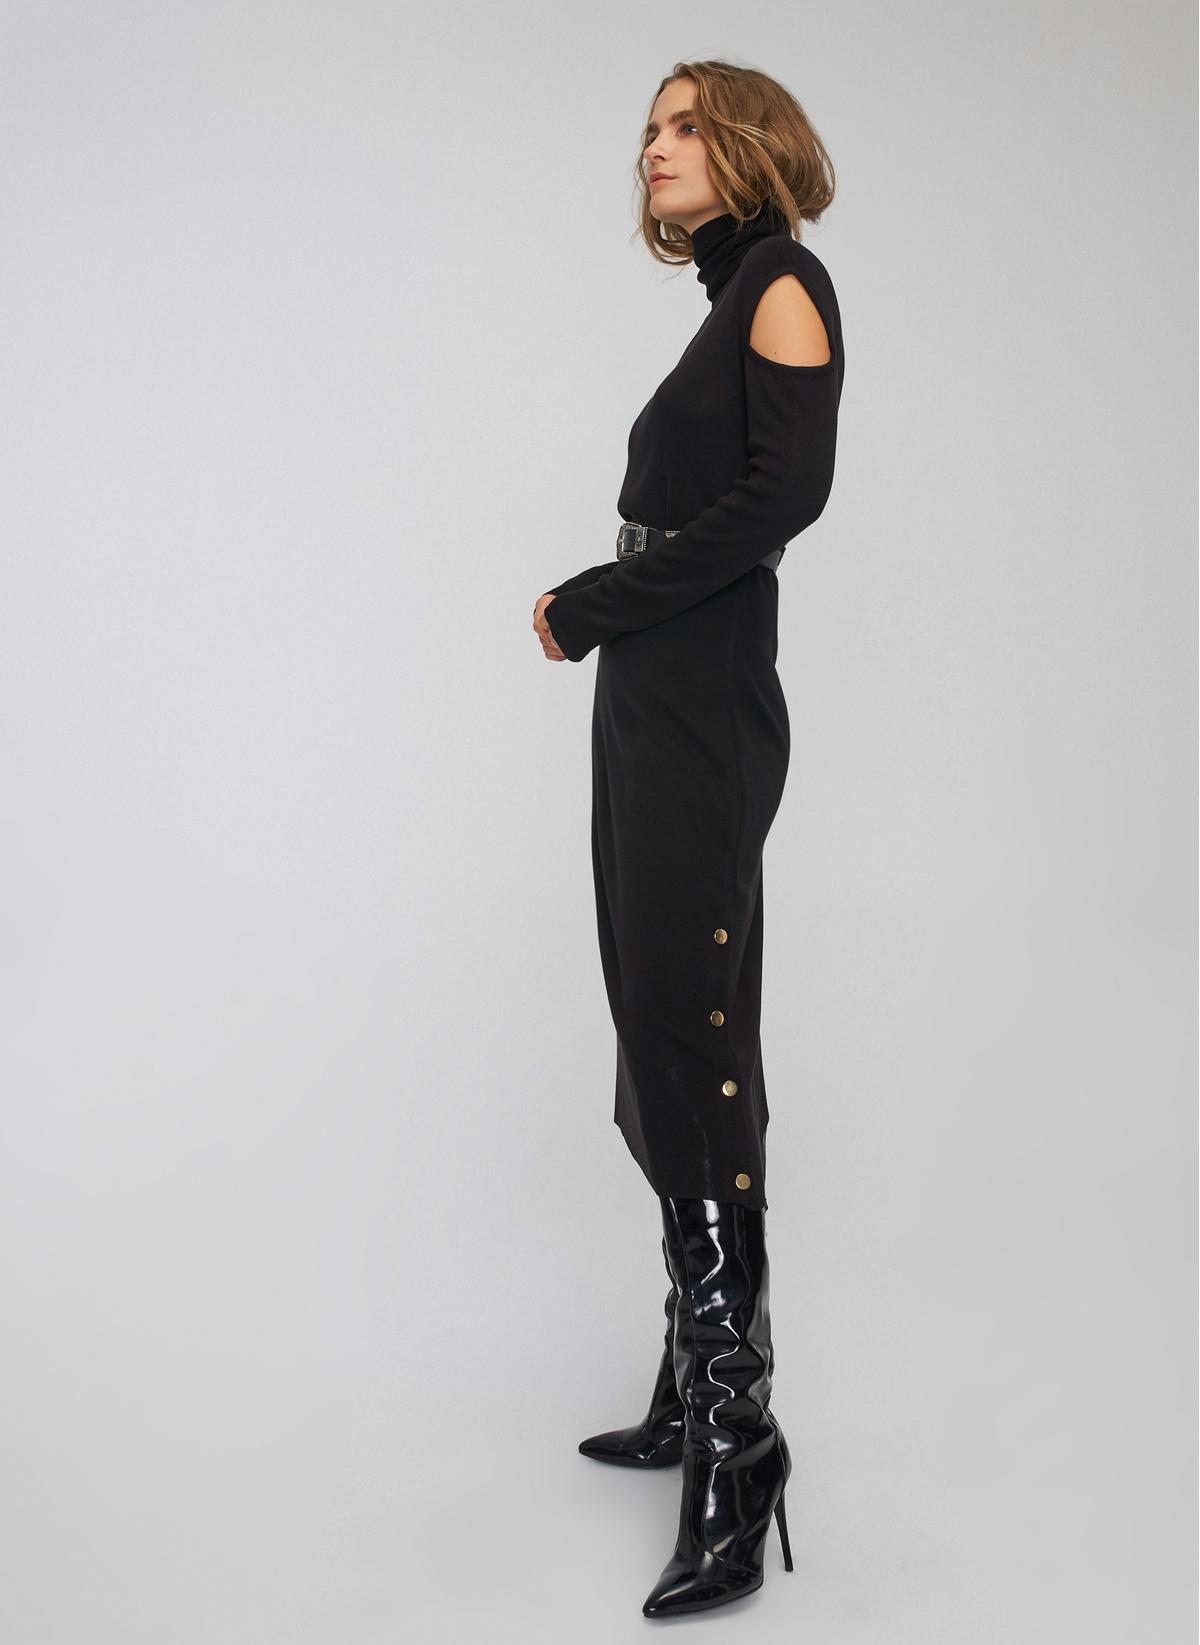 700802eed001c People By Fabrika Siyah Omuz Detaylı Triko Midi Elbise   ElbiseBul